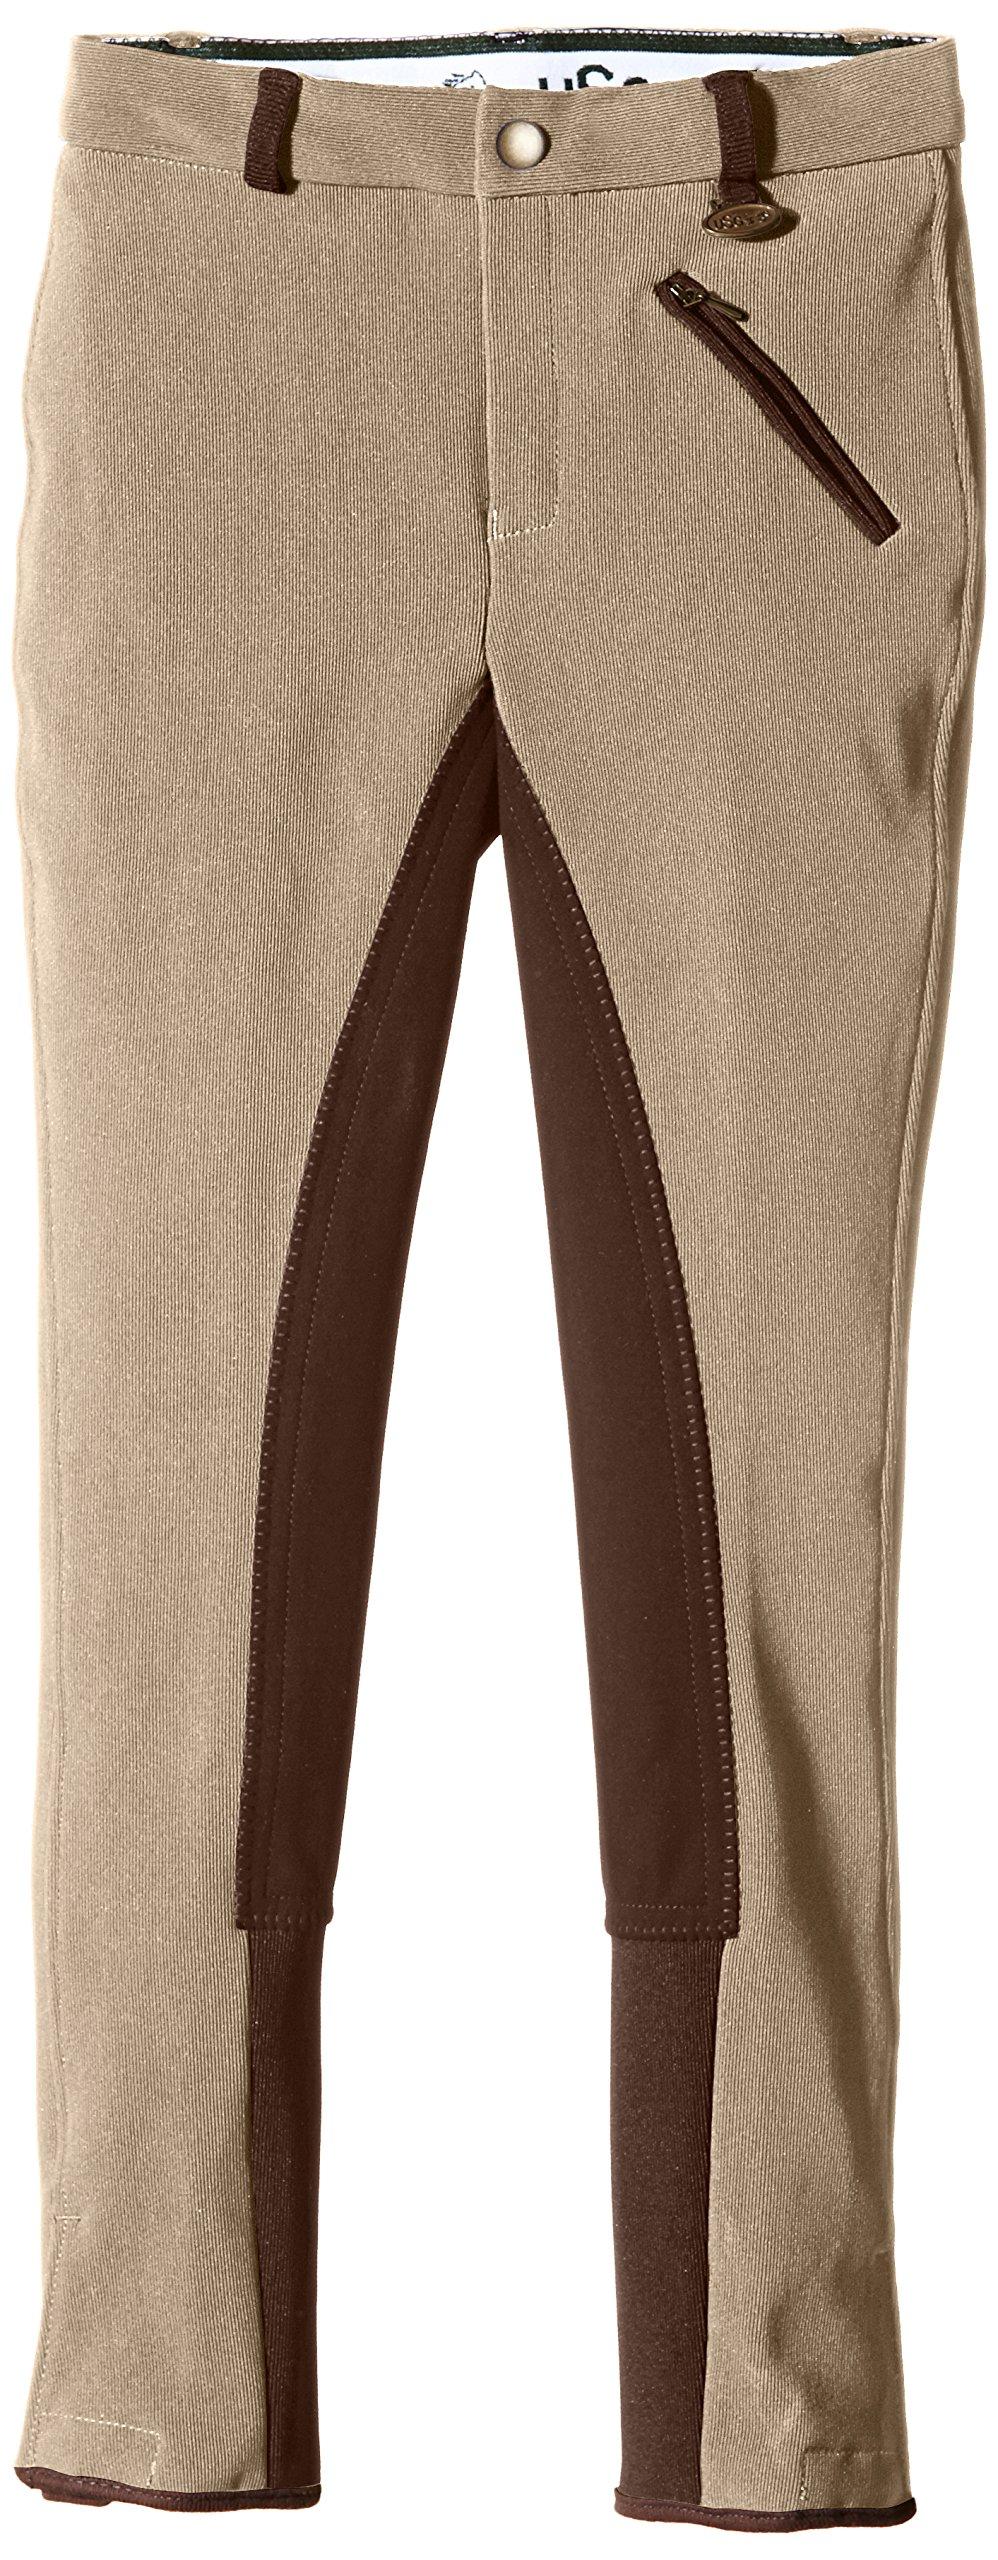 USG United Sportproducts, Pantaloni da equitazione Bambino Melanie, Beige (Beige/Braun), 122 cm